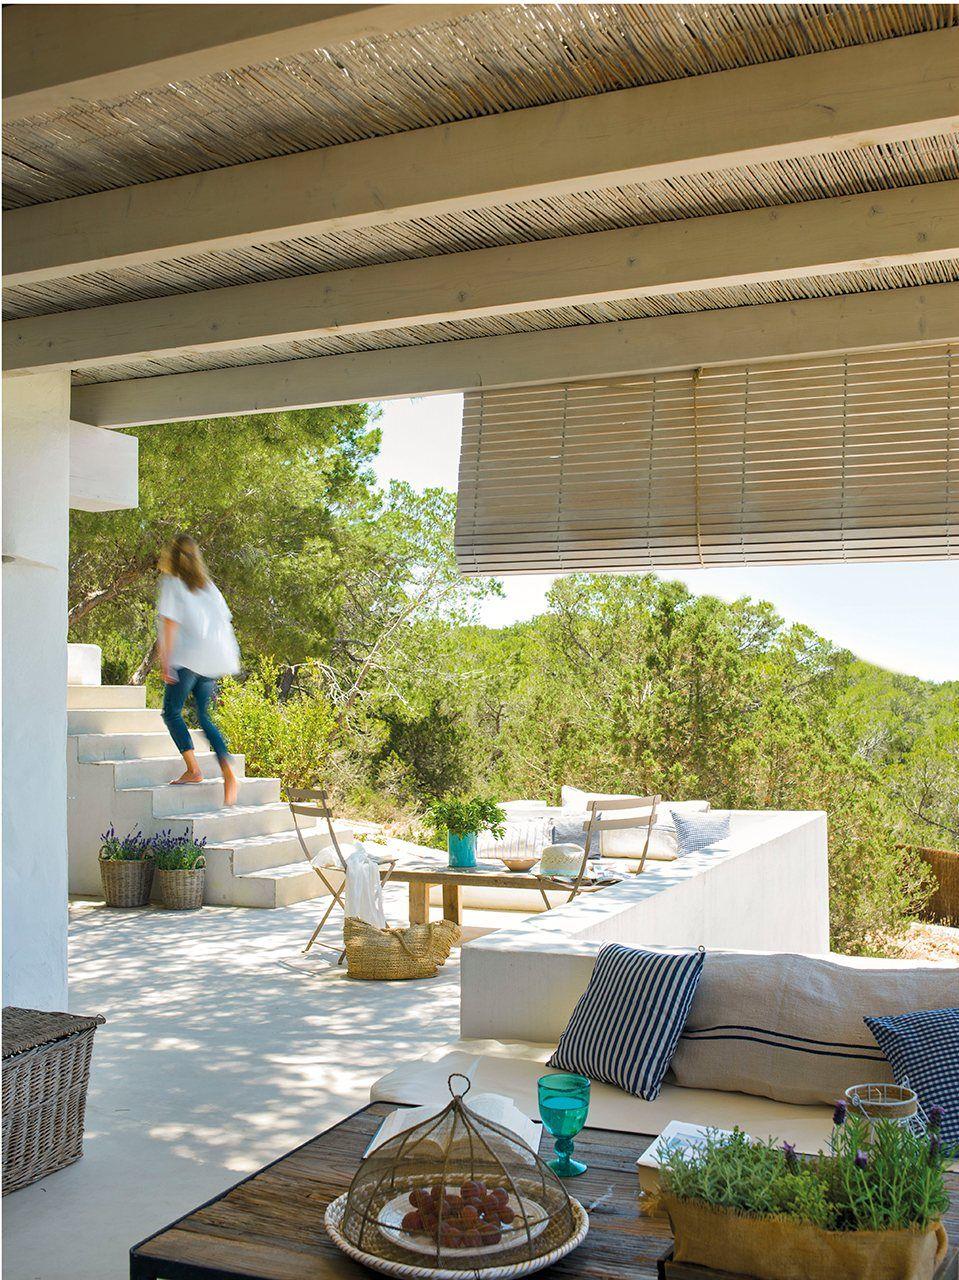 verano en el porche deco maroc pinterest veranda maison et jardins. Black Bedroom Furniture Sets. Home Design Ideas